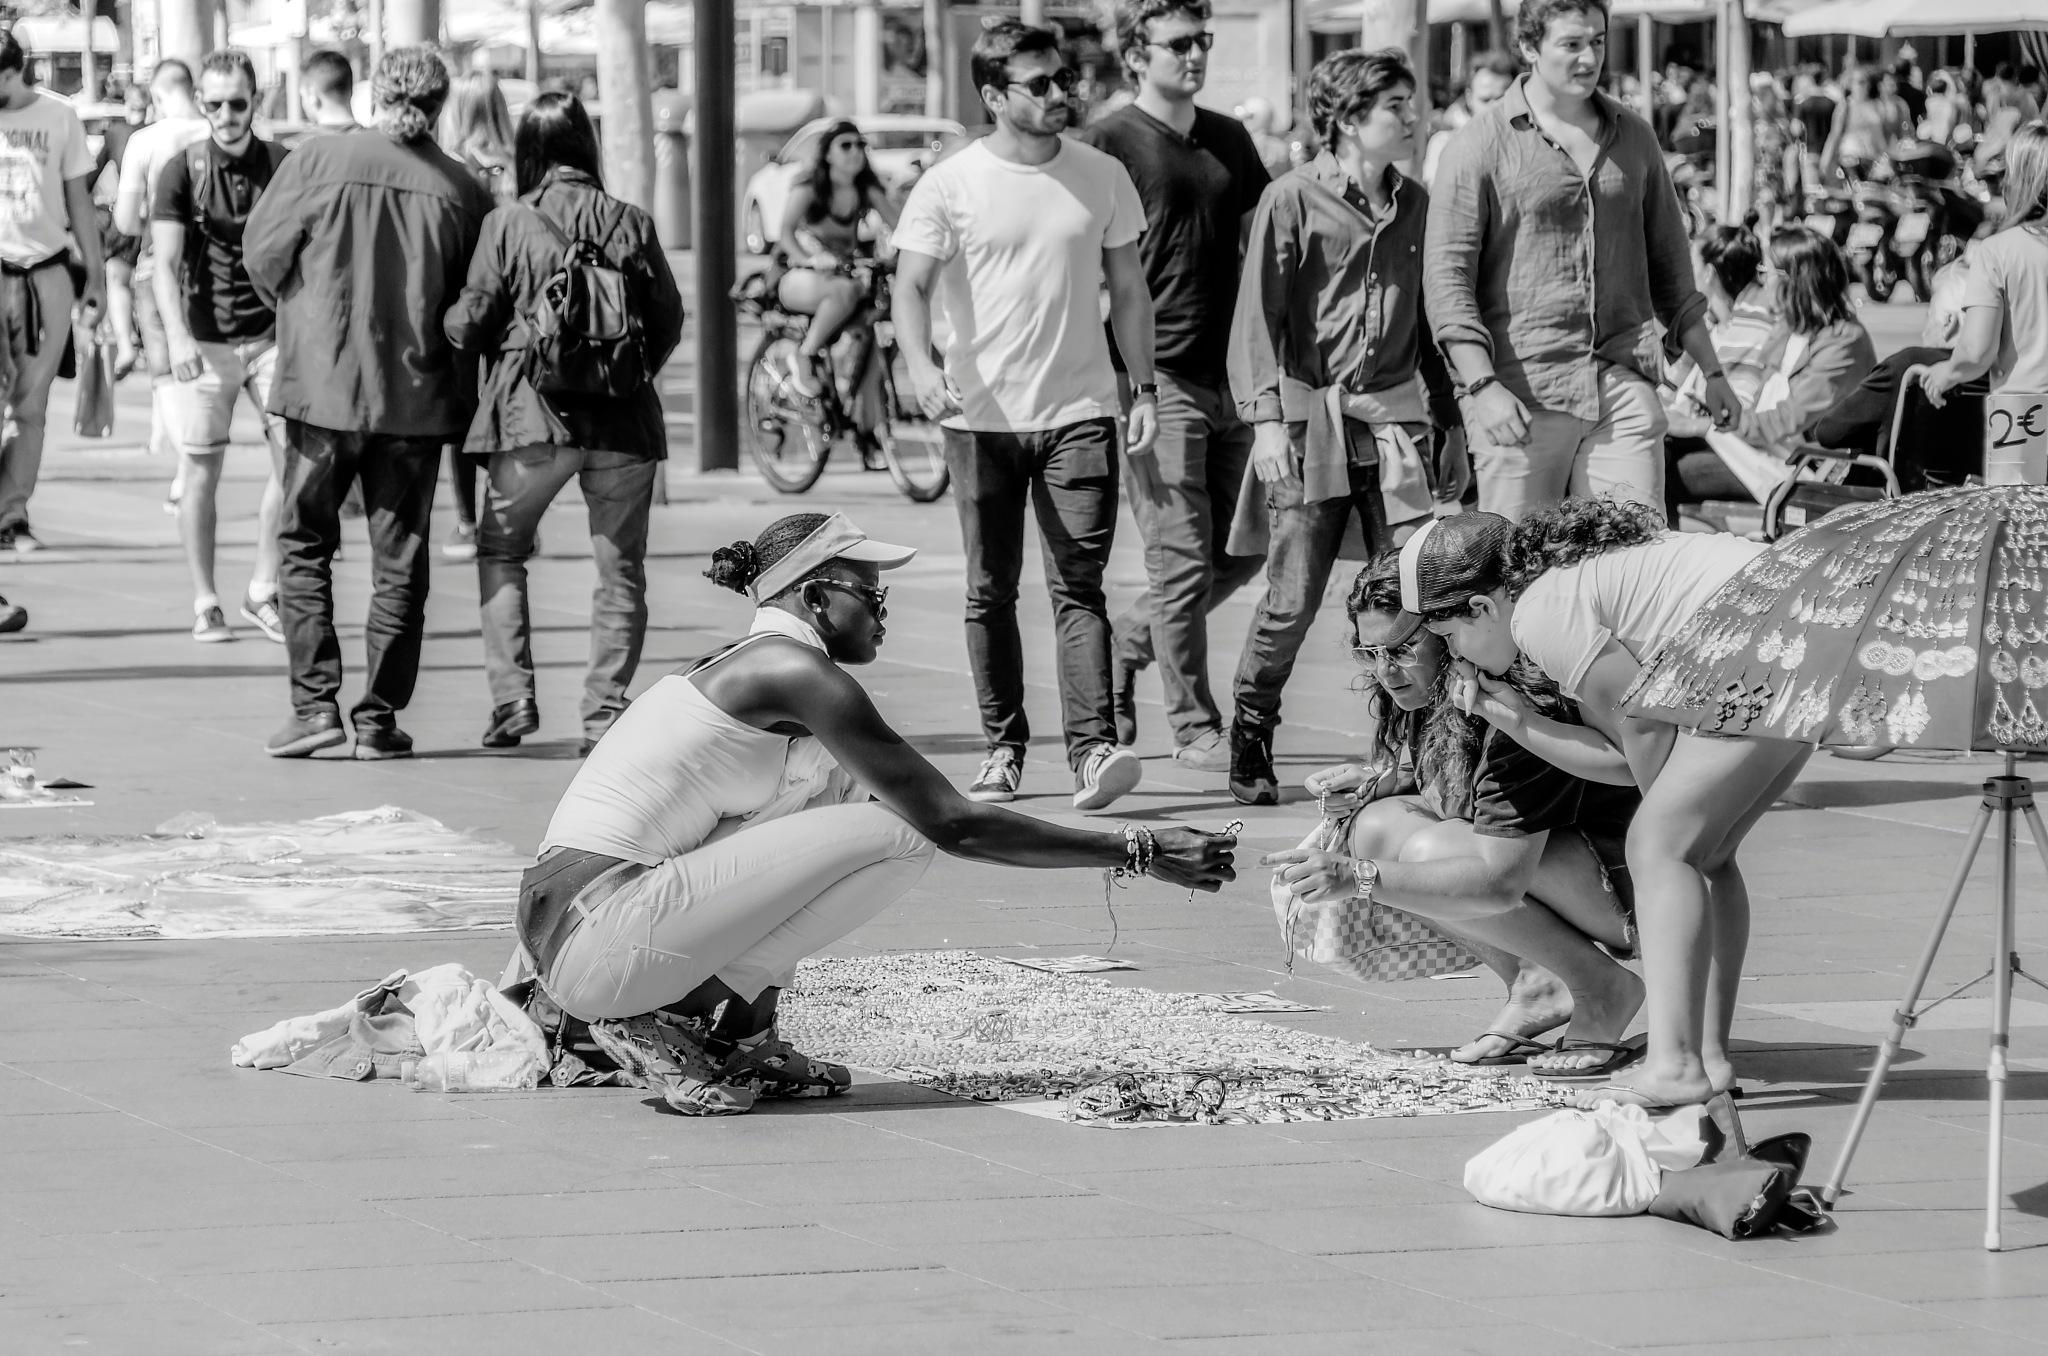 Luchadora! by Miguel Angel Barroso Lorenzo